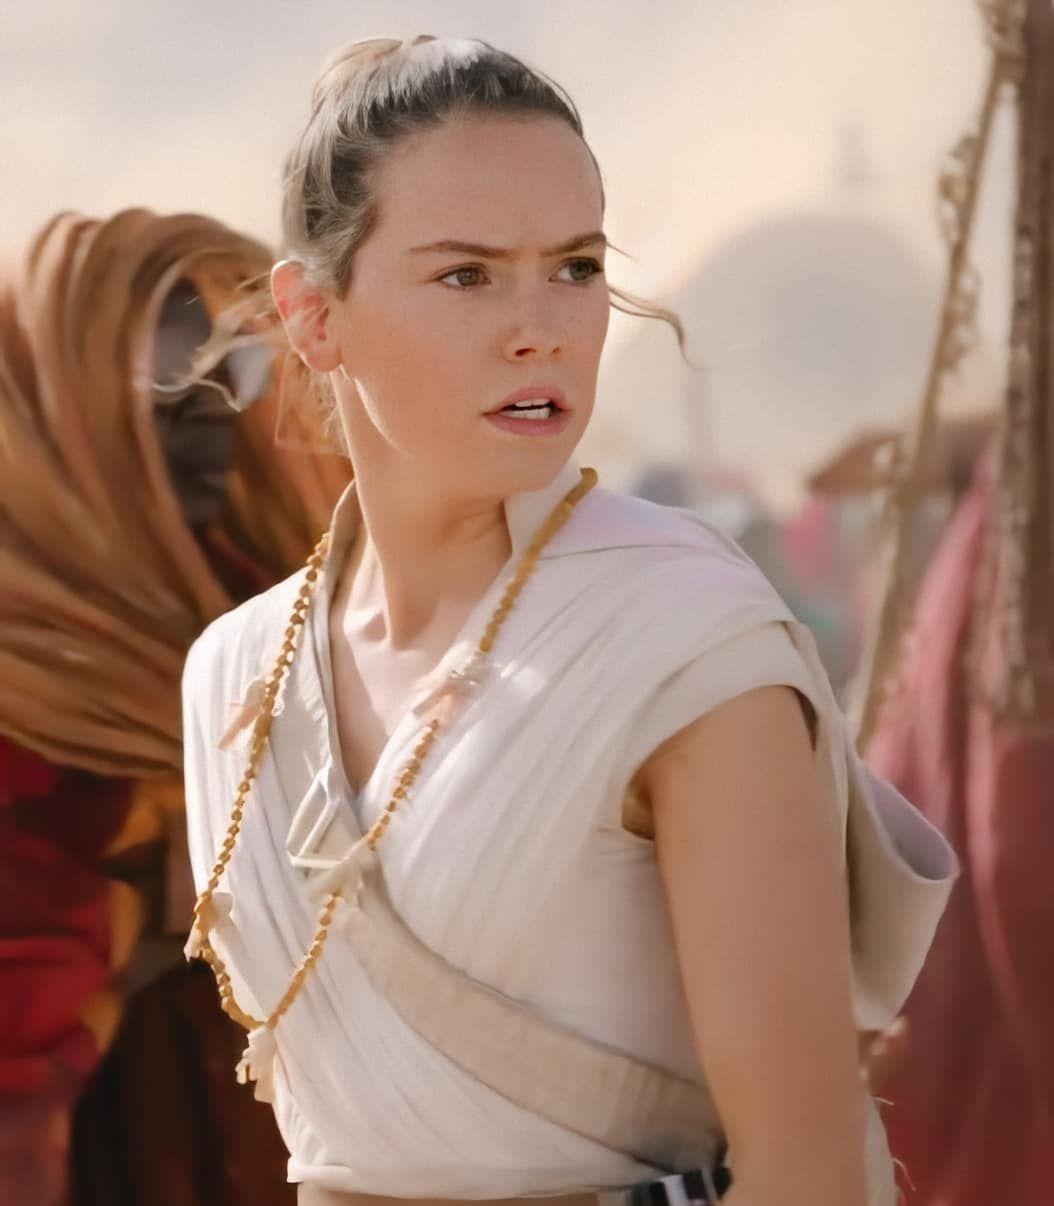 Pin By Chloe Cosplay On Rey Tros In 2020 Rey Star Wars Daisy Ridley Star Wars Star Wars Costumes